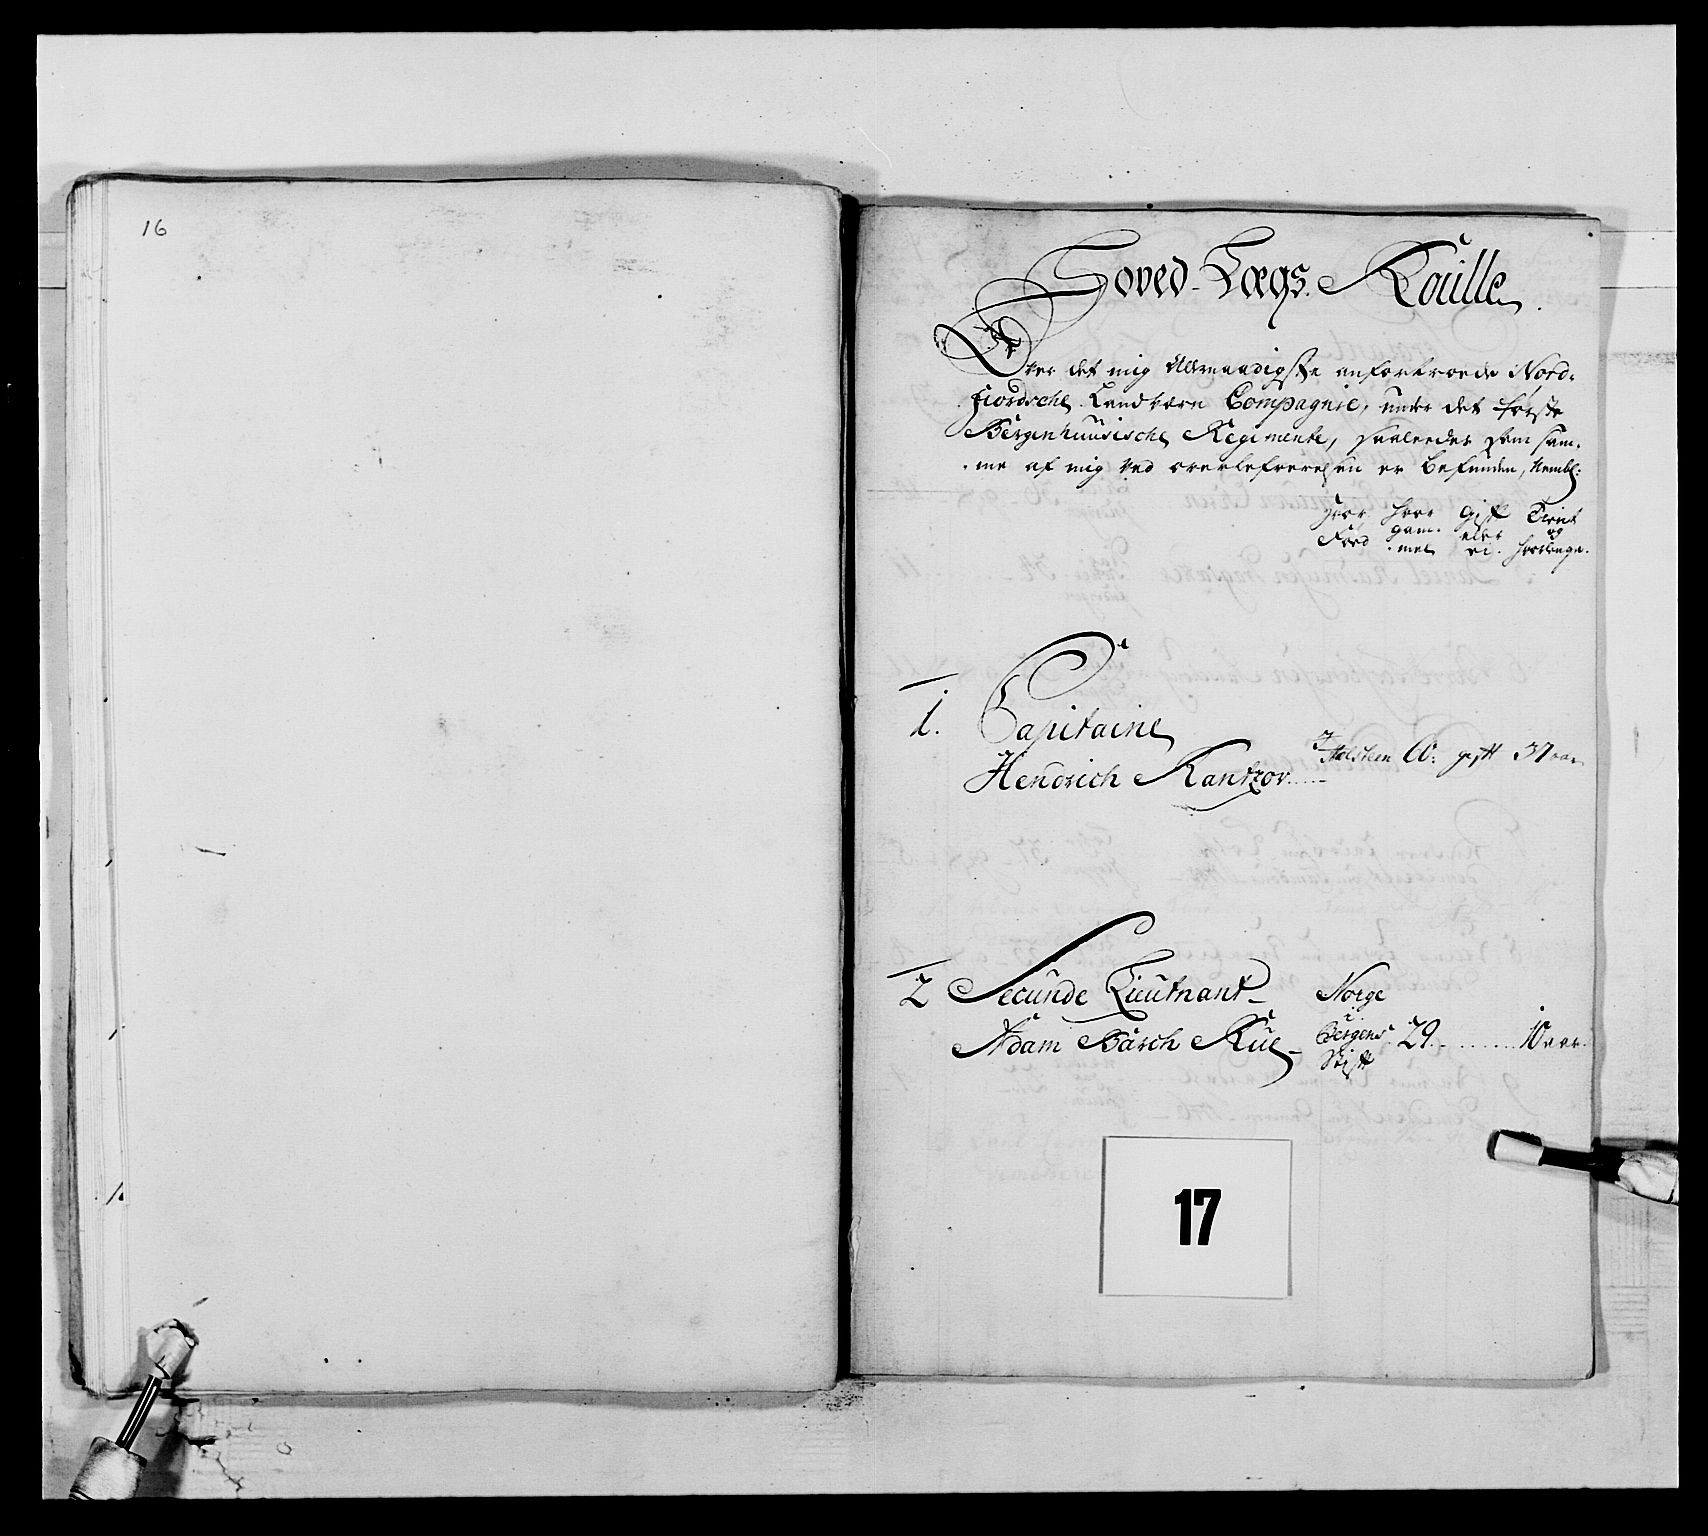 RA, Kommanderende general (KG I) med Det norske krigsdirektorium, E/Ea/L0517: 1. Bergenhusiske regiment, 1742-1756, s. 181